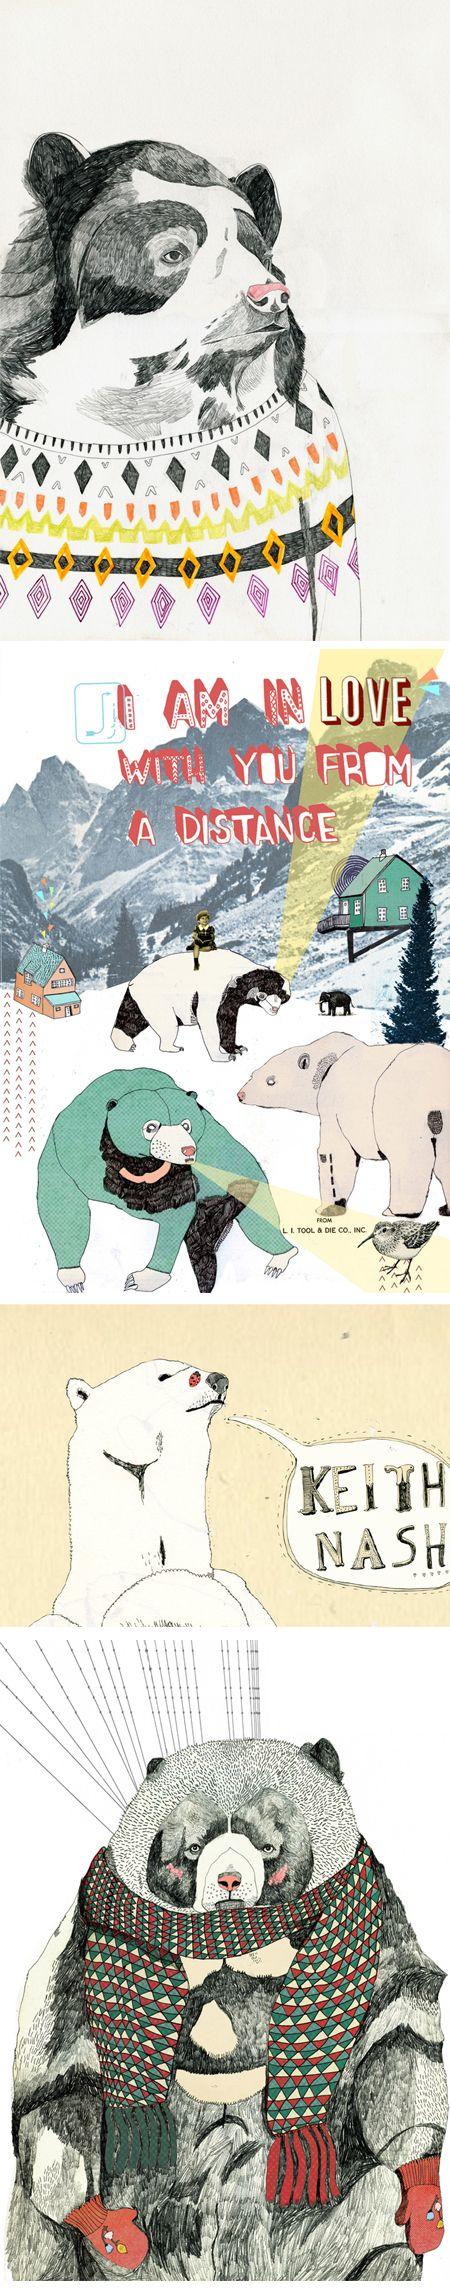 julia pottJulia Potts, Curator Contemporary, Polar Bears, Jealous Curator, Fashion Models, Contemporary Art, Bears Art, Animal Etchings Design, Art Illustration